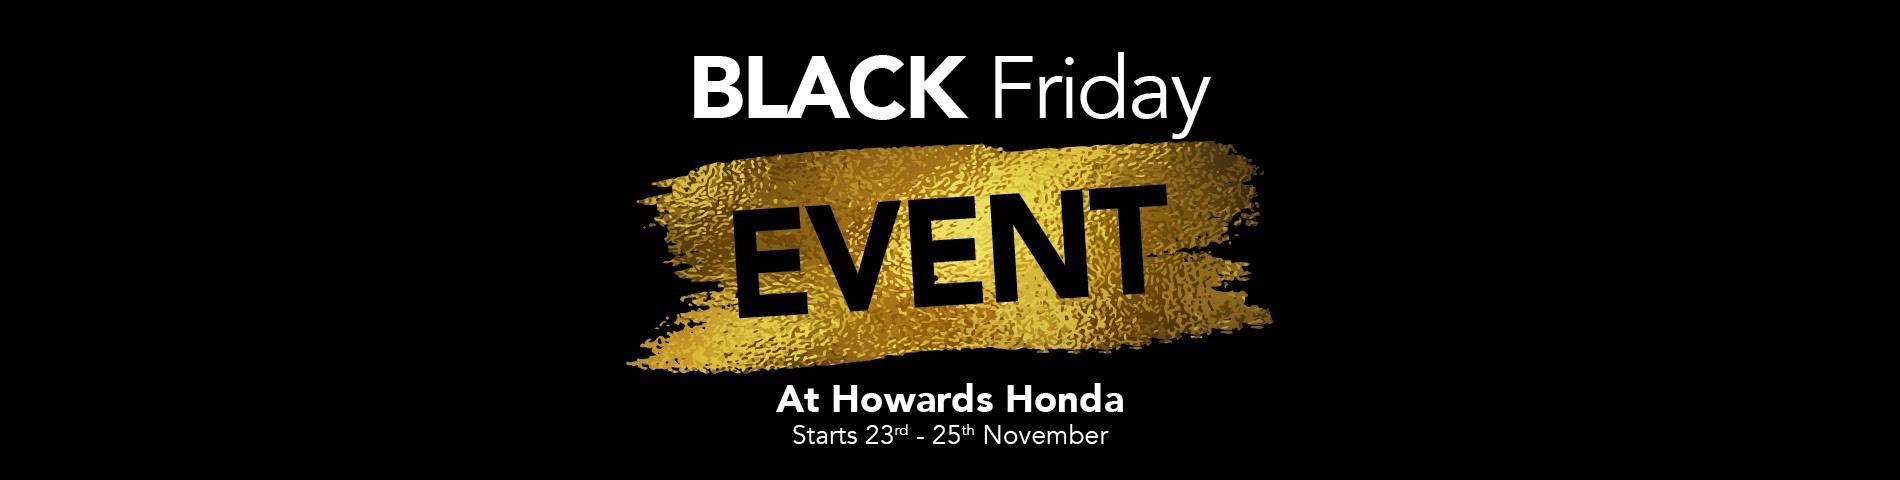 Honda Black Friday